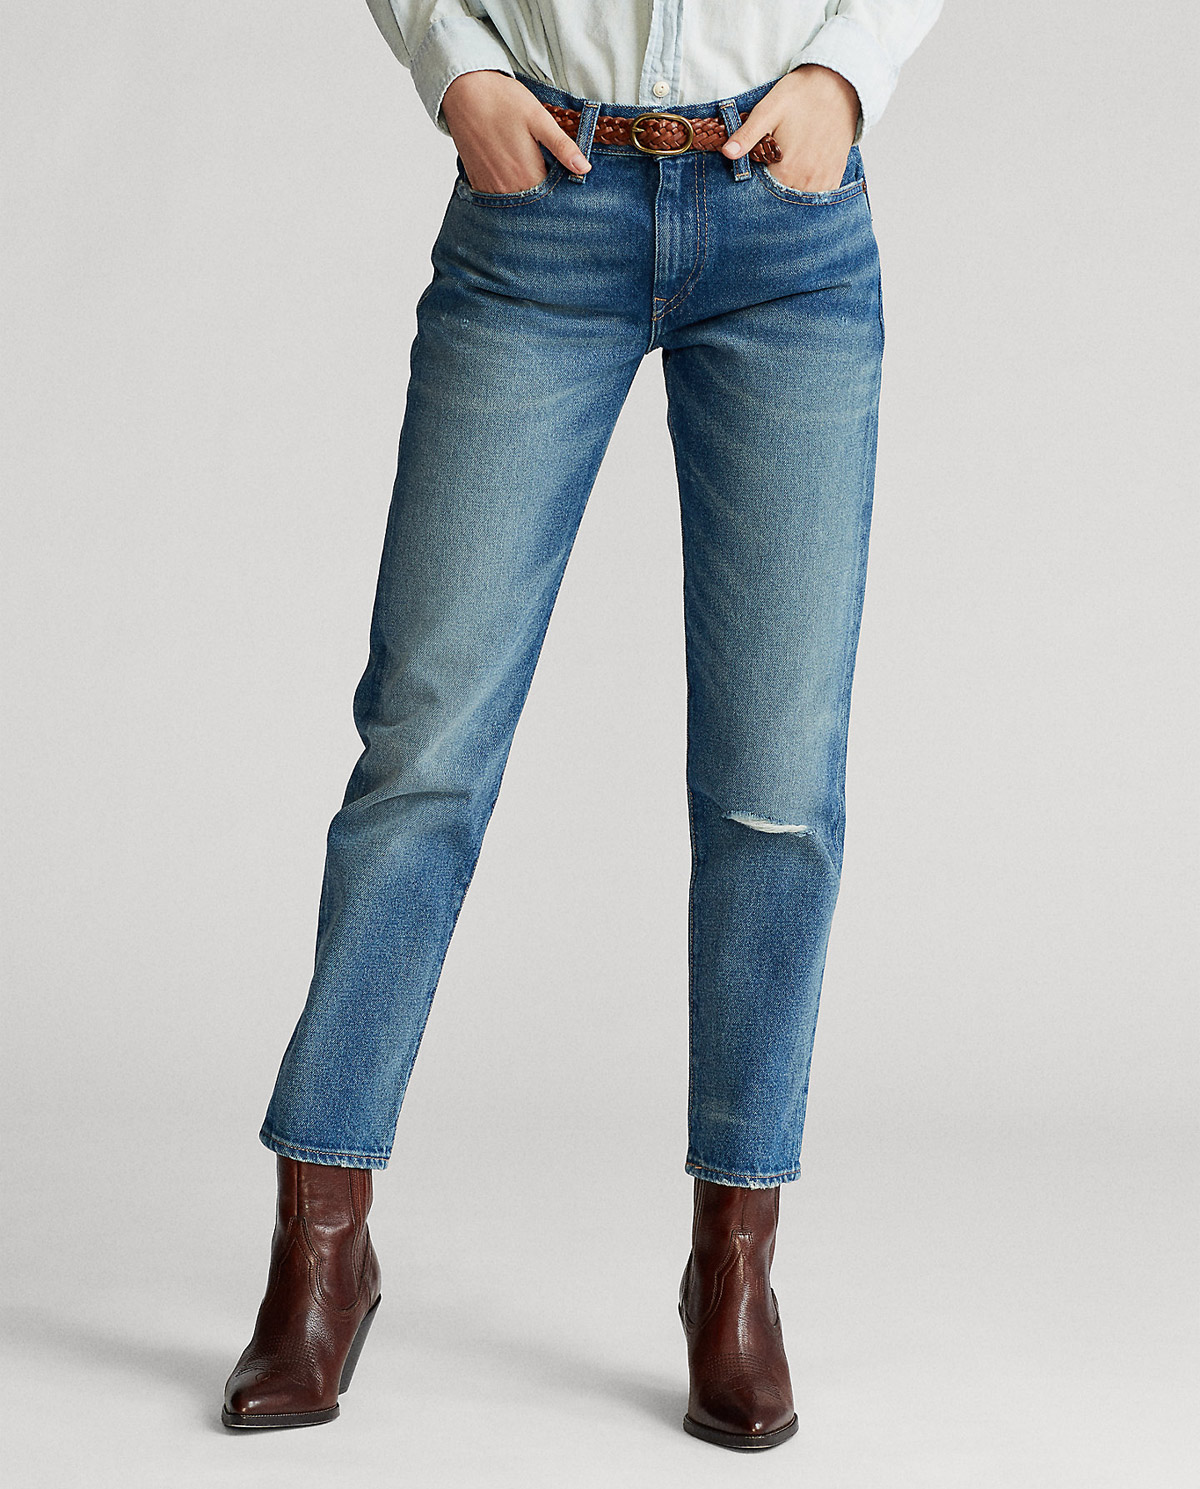 Damskie jeansy Boyfriend Polo Ralph Lauren 211777202001